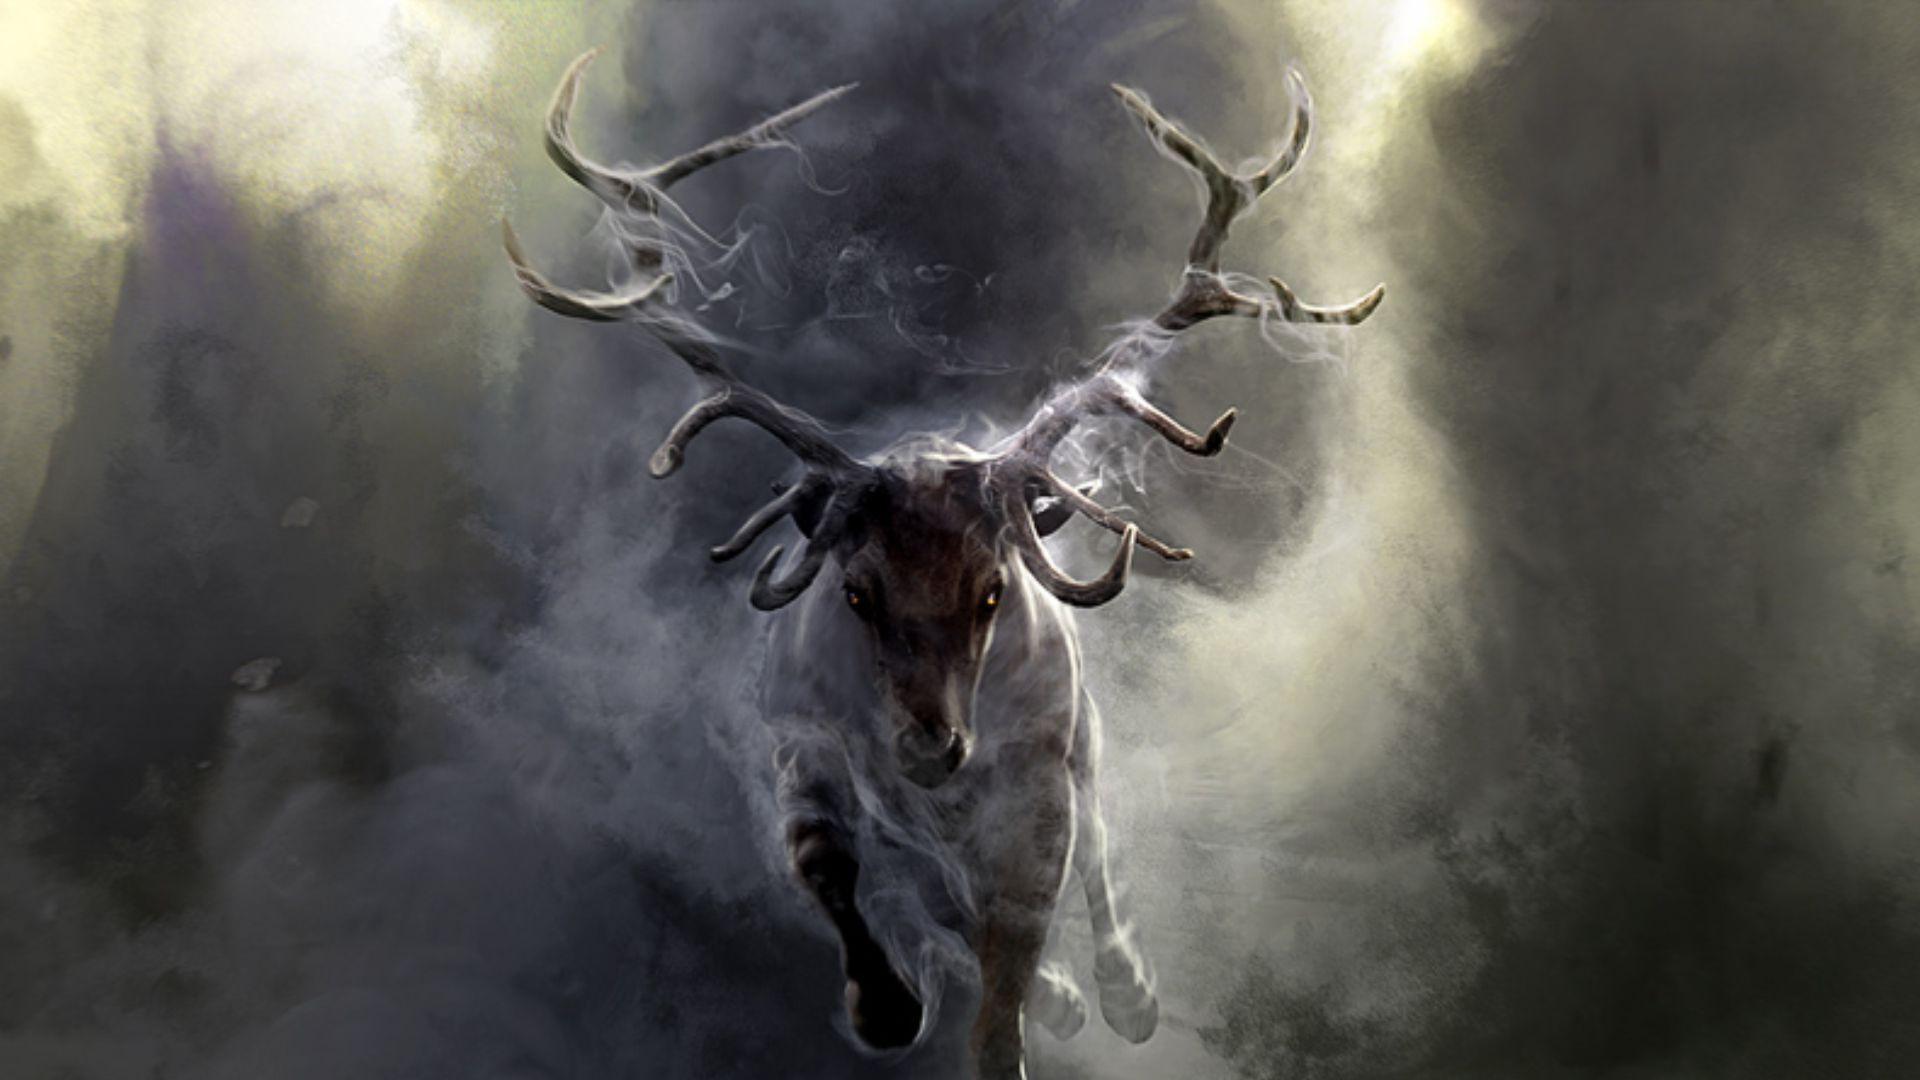 cool deer pics